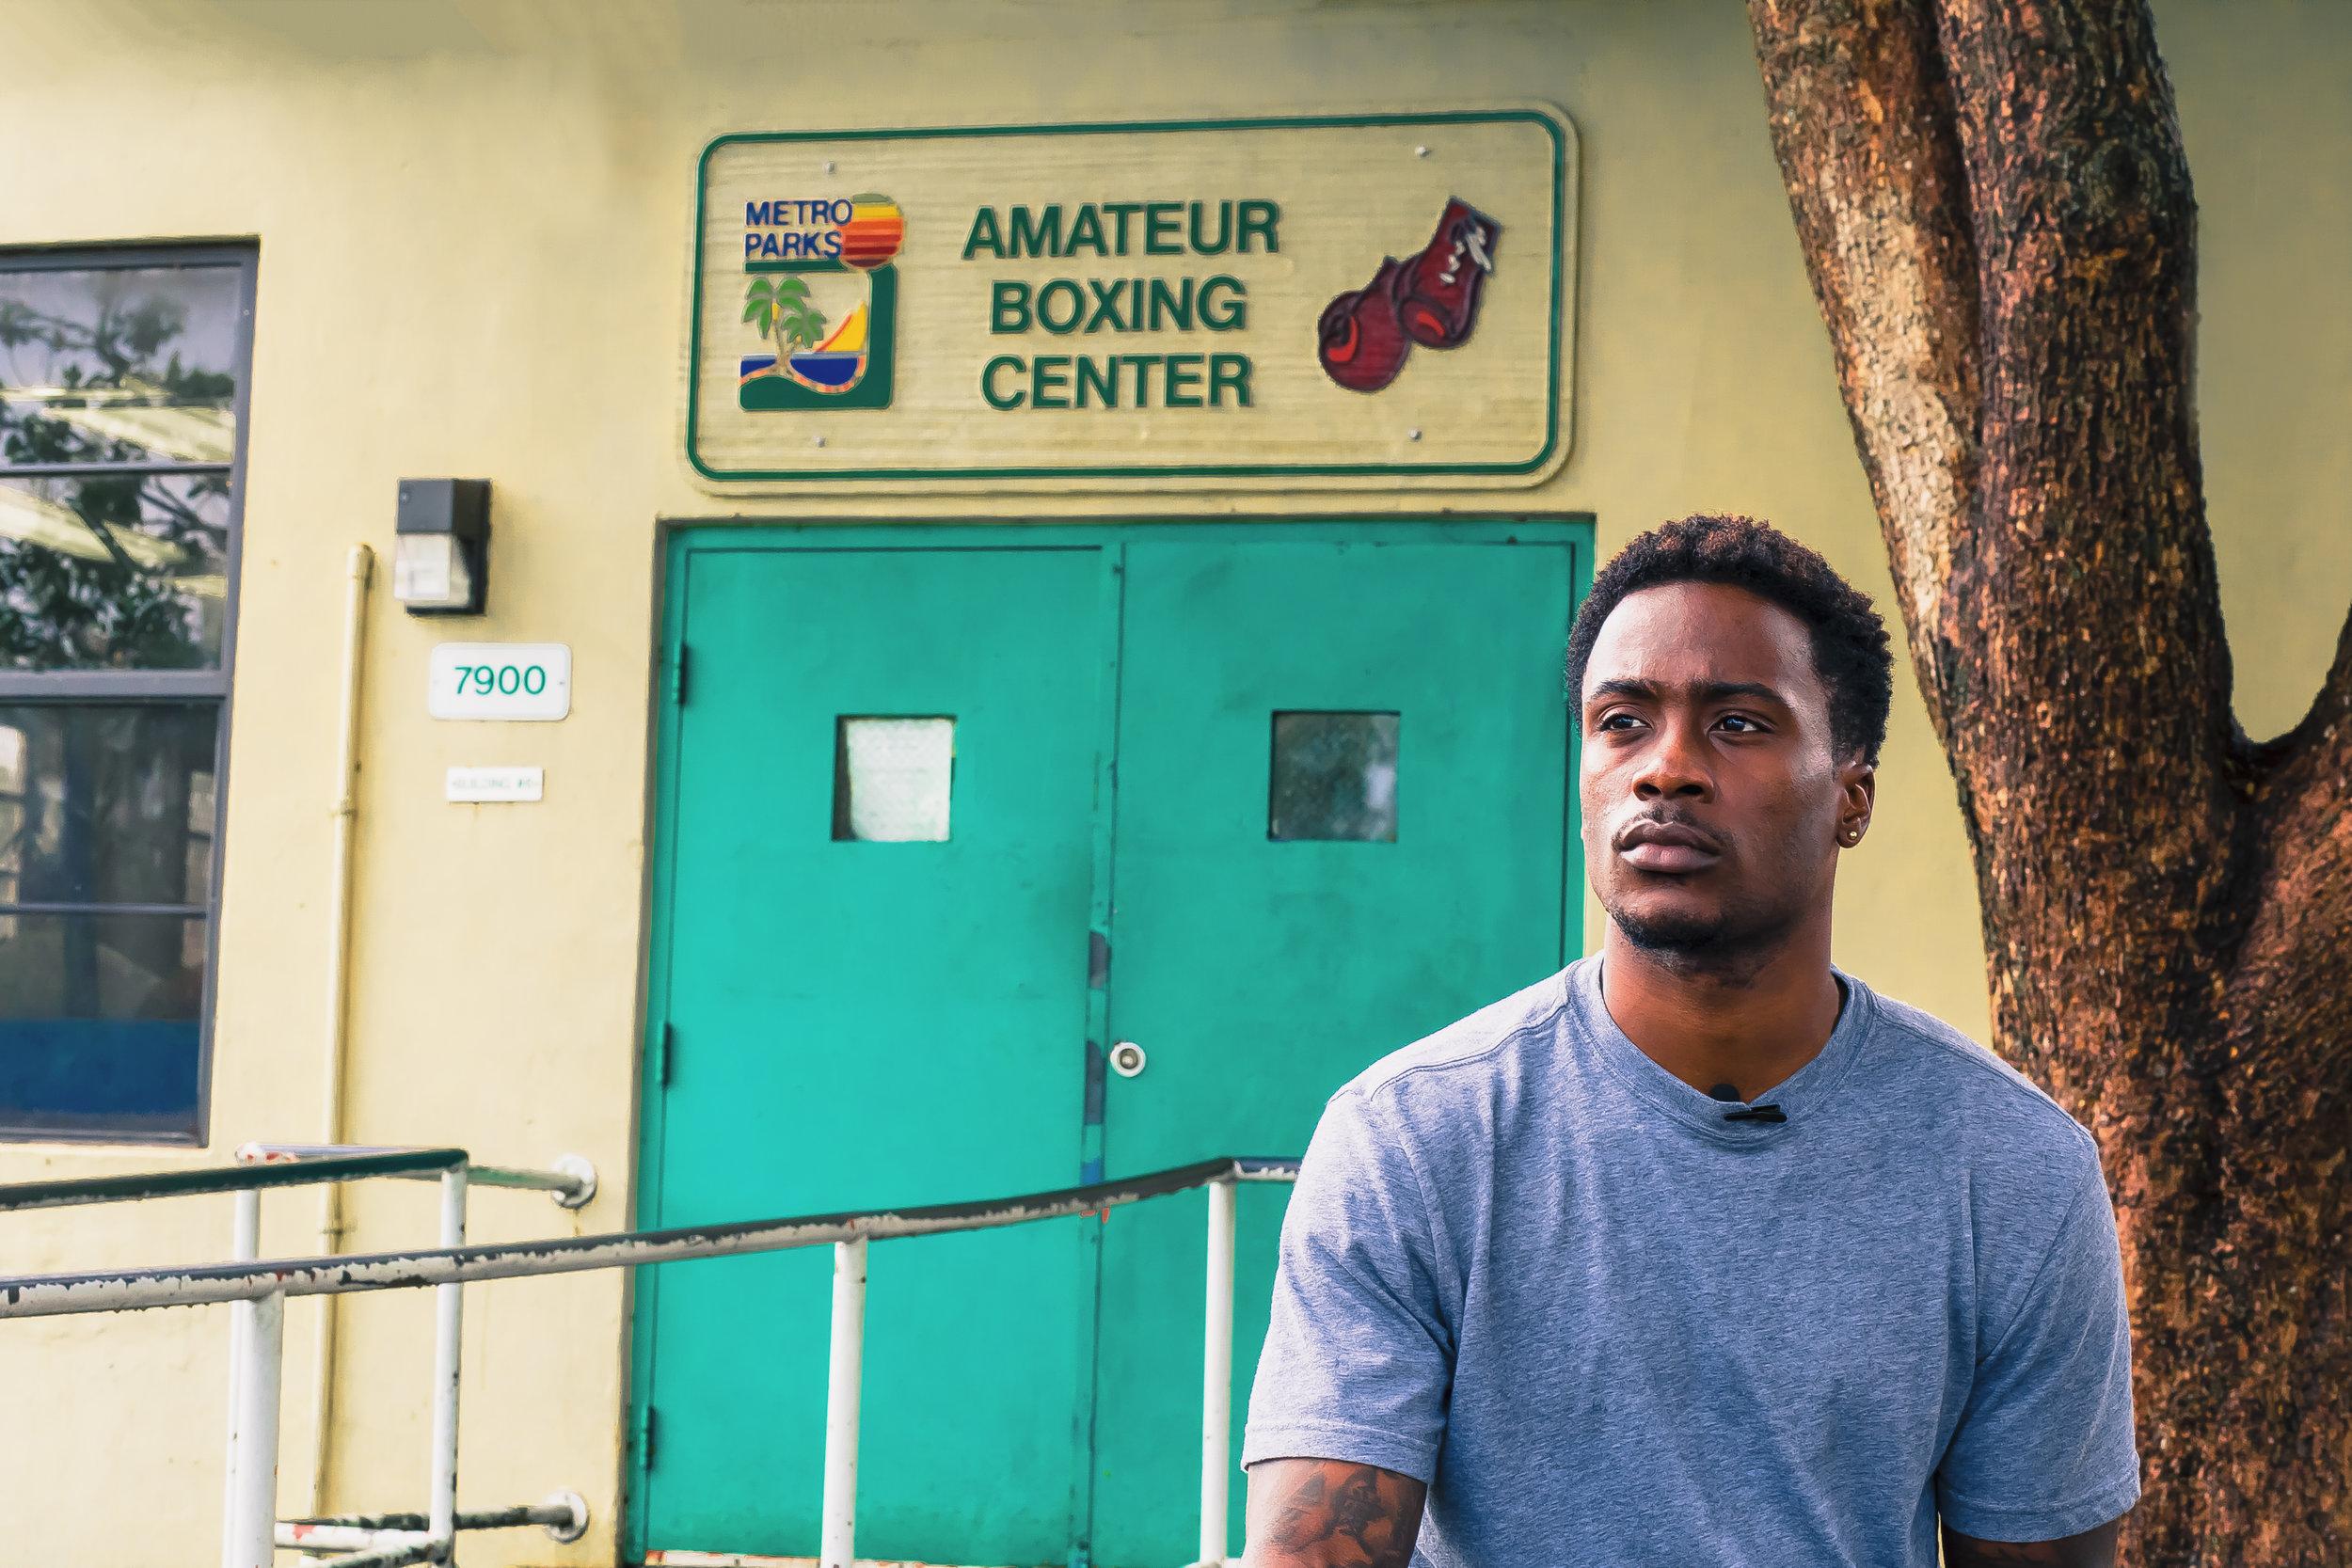 Boxer-Interview-Edit.jpg